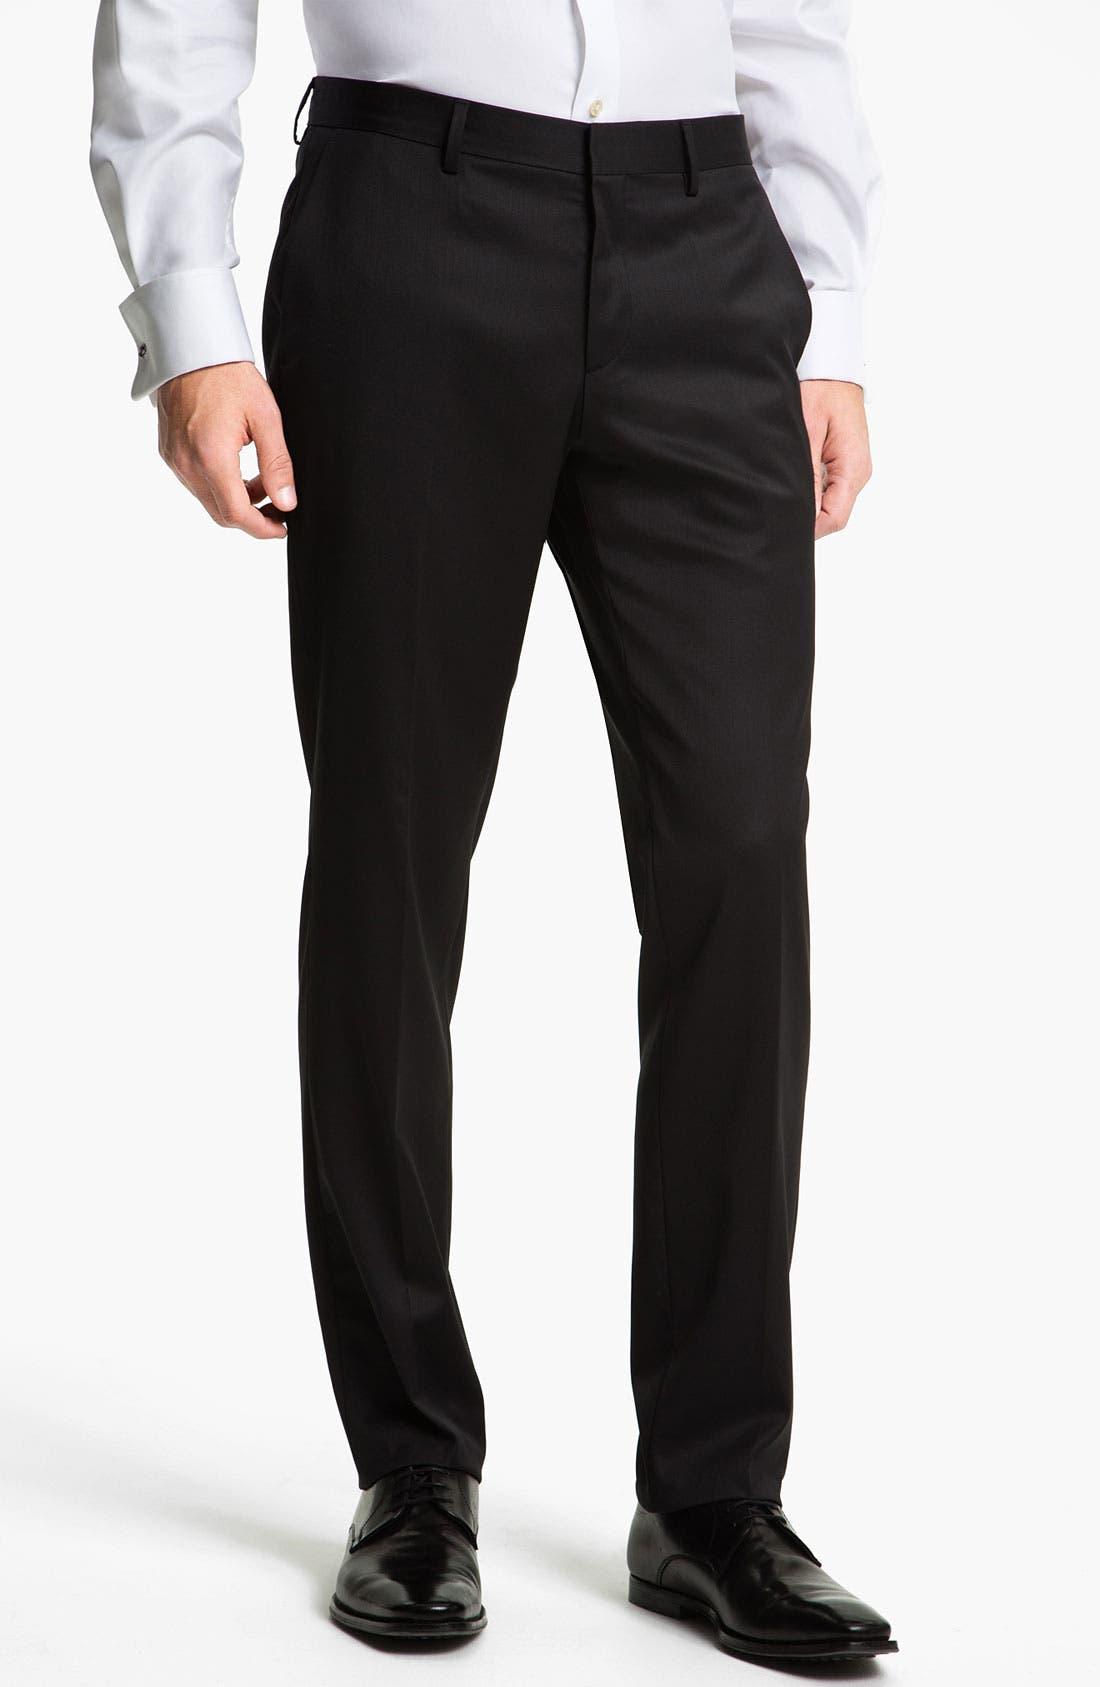 Alternate Image 1 Selected - BOSS Black 'Genesis' Formal Trousers